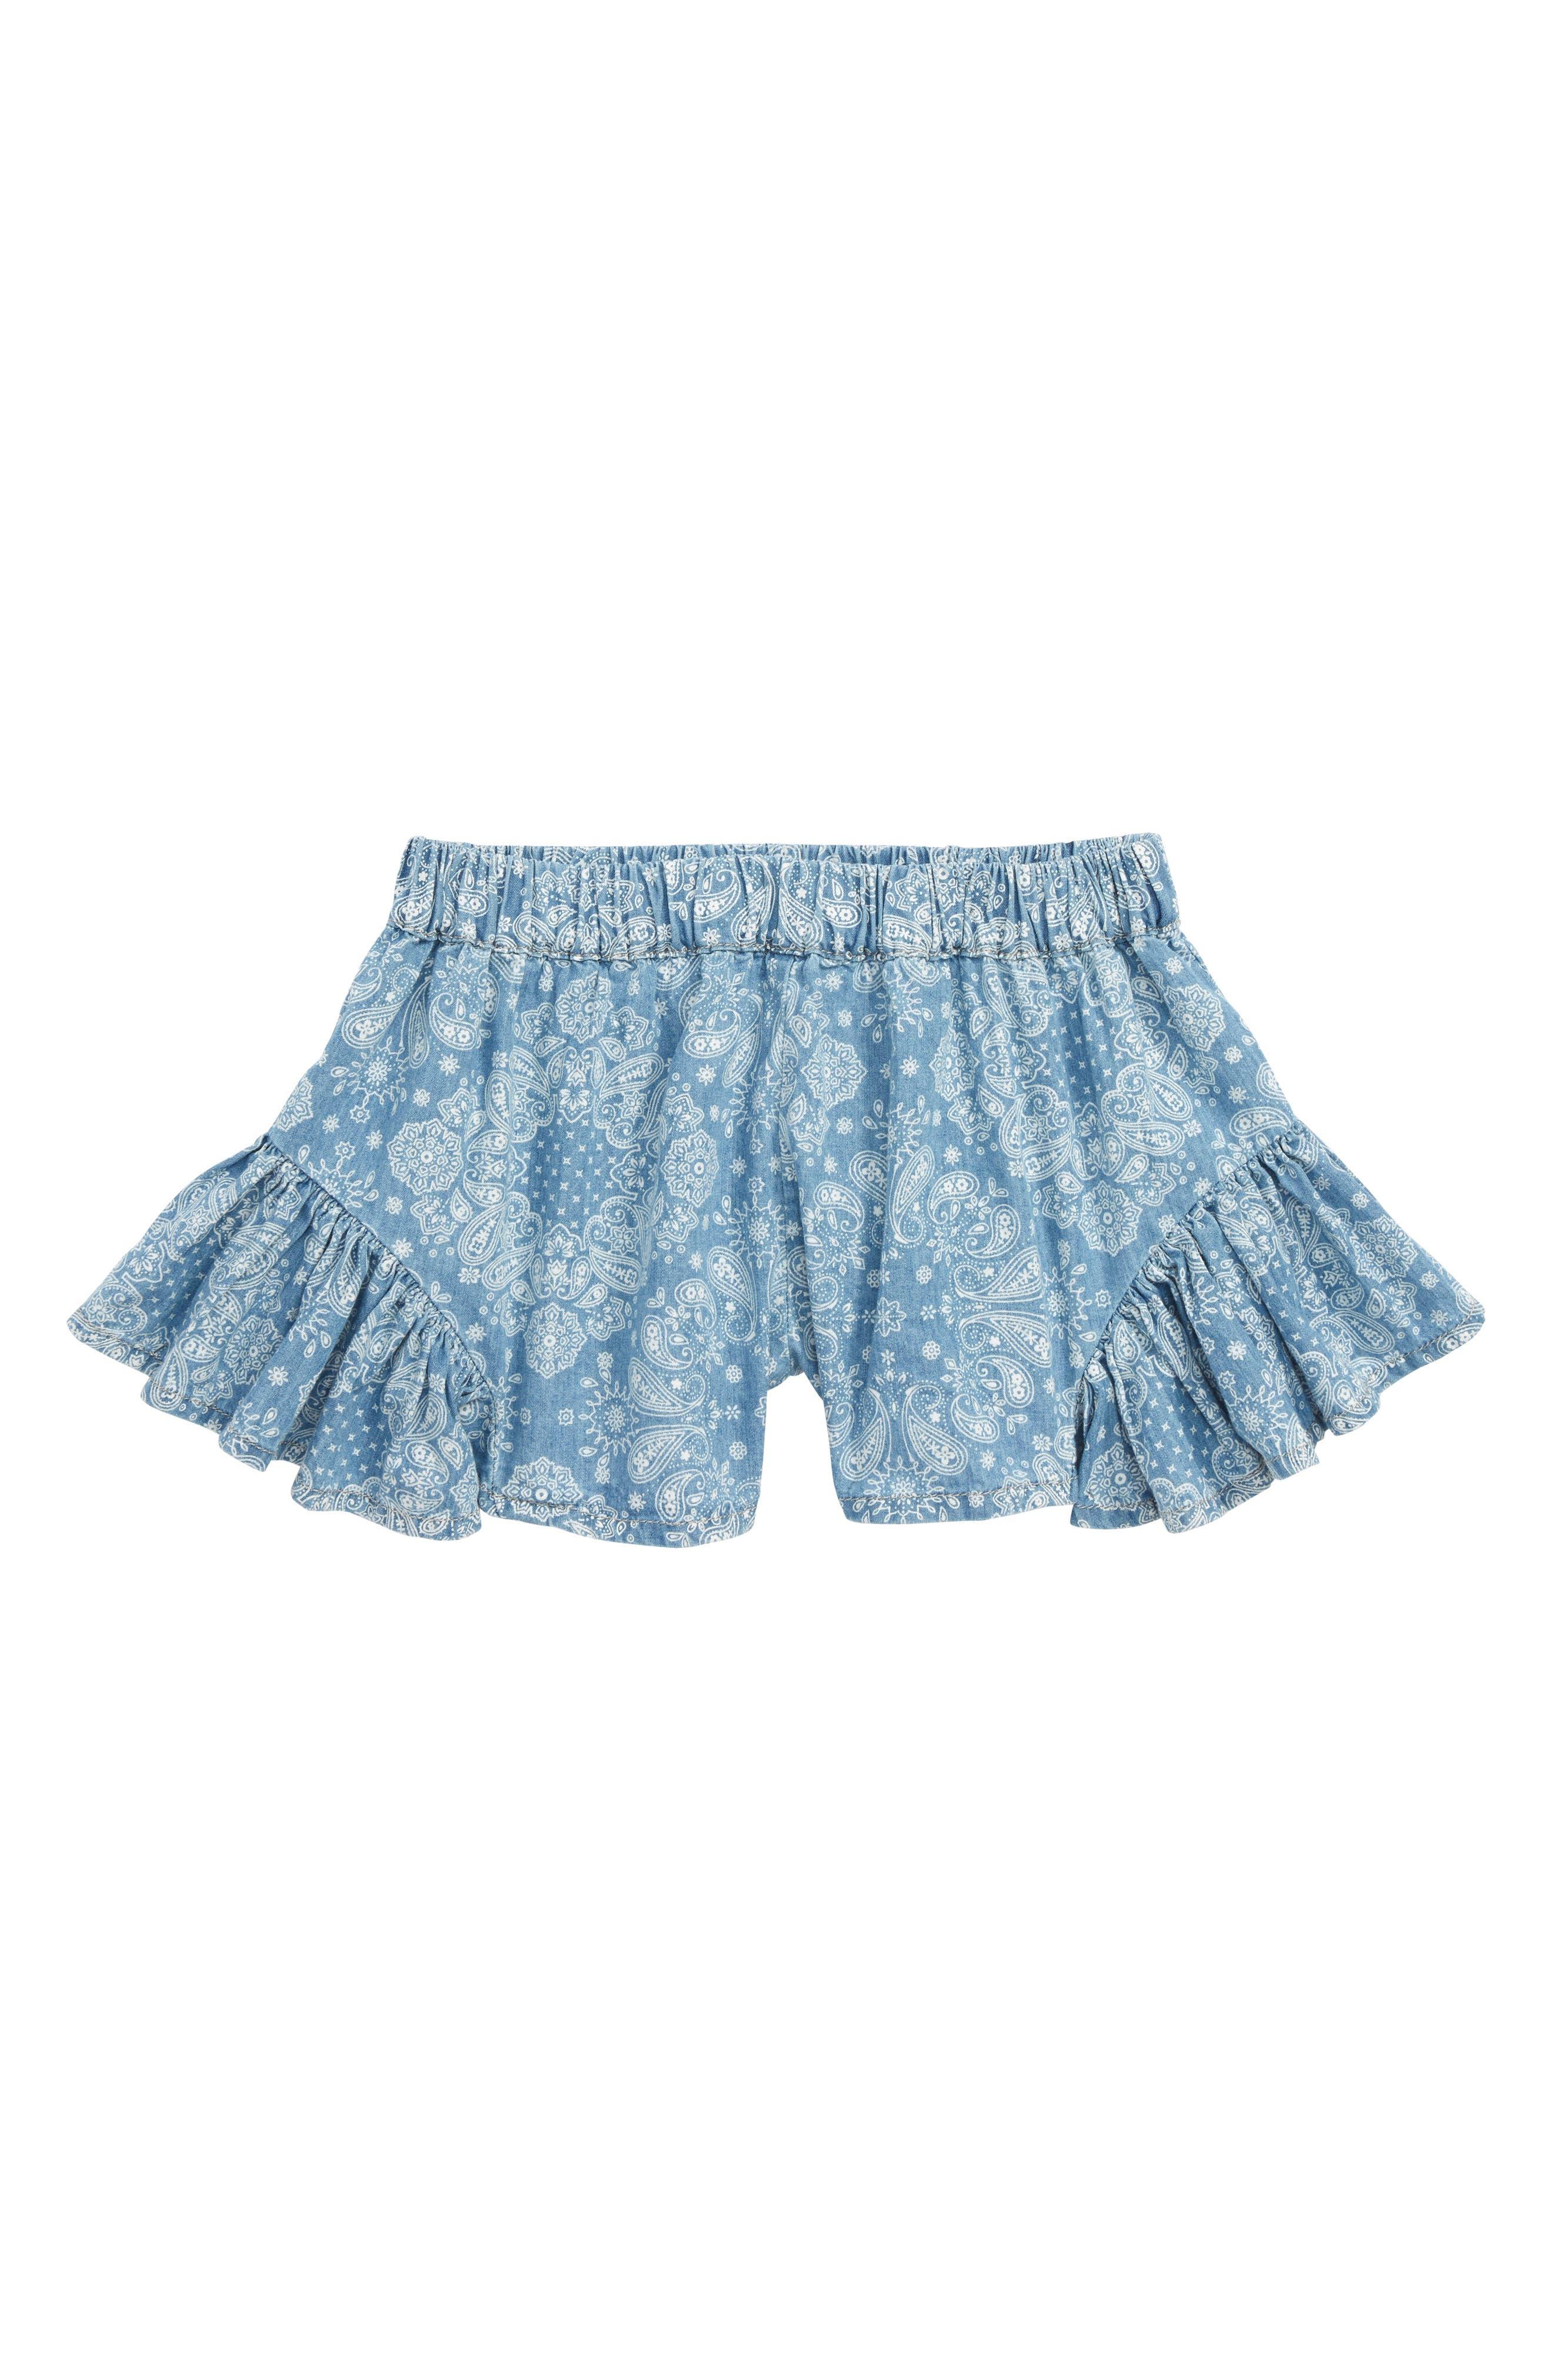 Bandana Print Ruffle Shorts,                         Main,                         color, 450